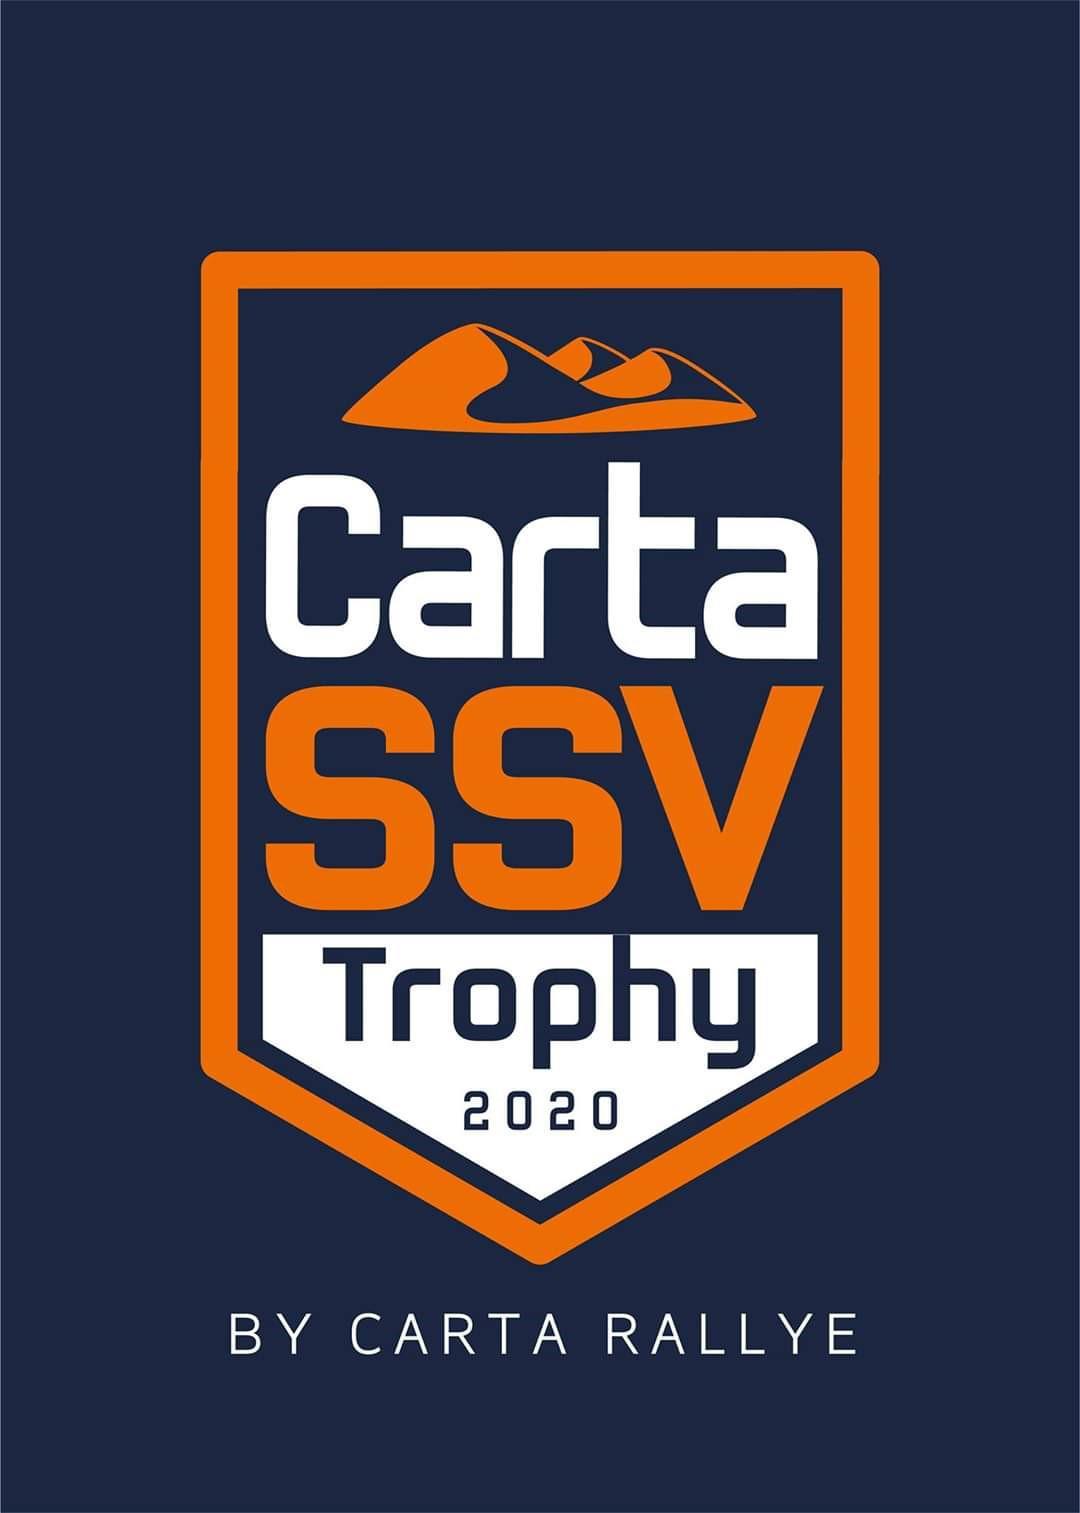 carta-ssv-trophy-annonce-un-partenariat-avec-polaris-maroc-1294-1.jpg